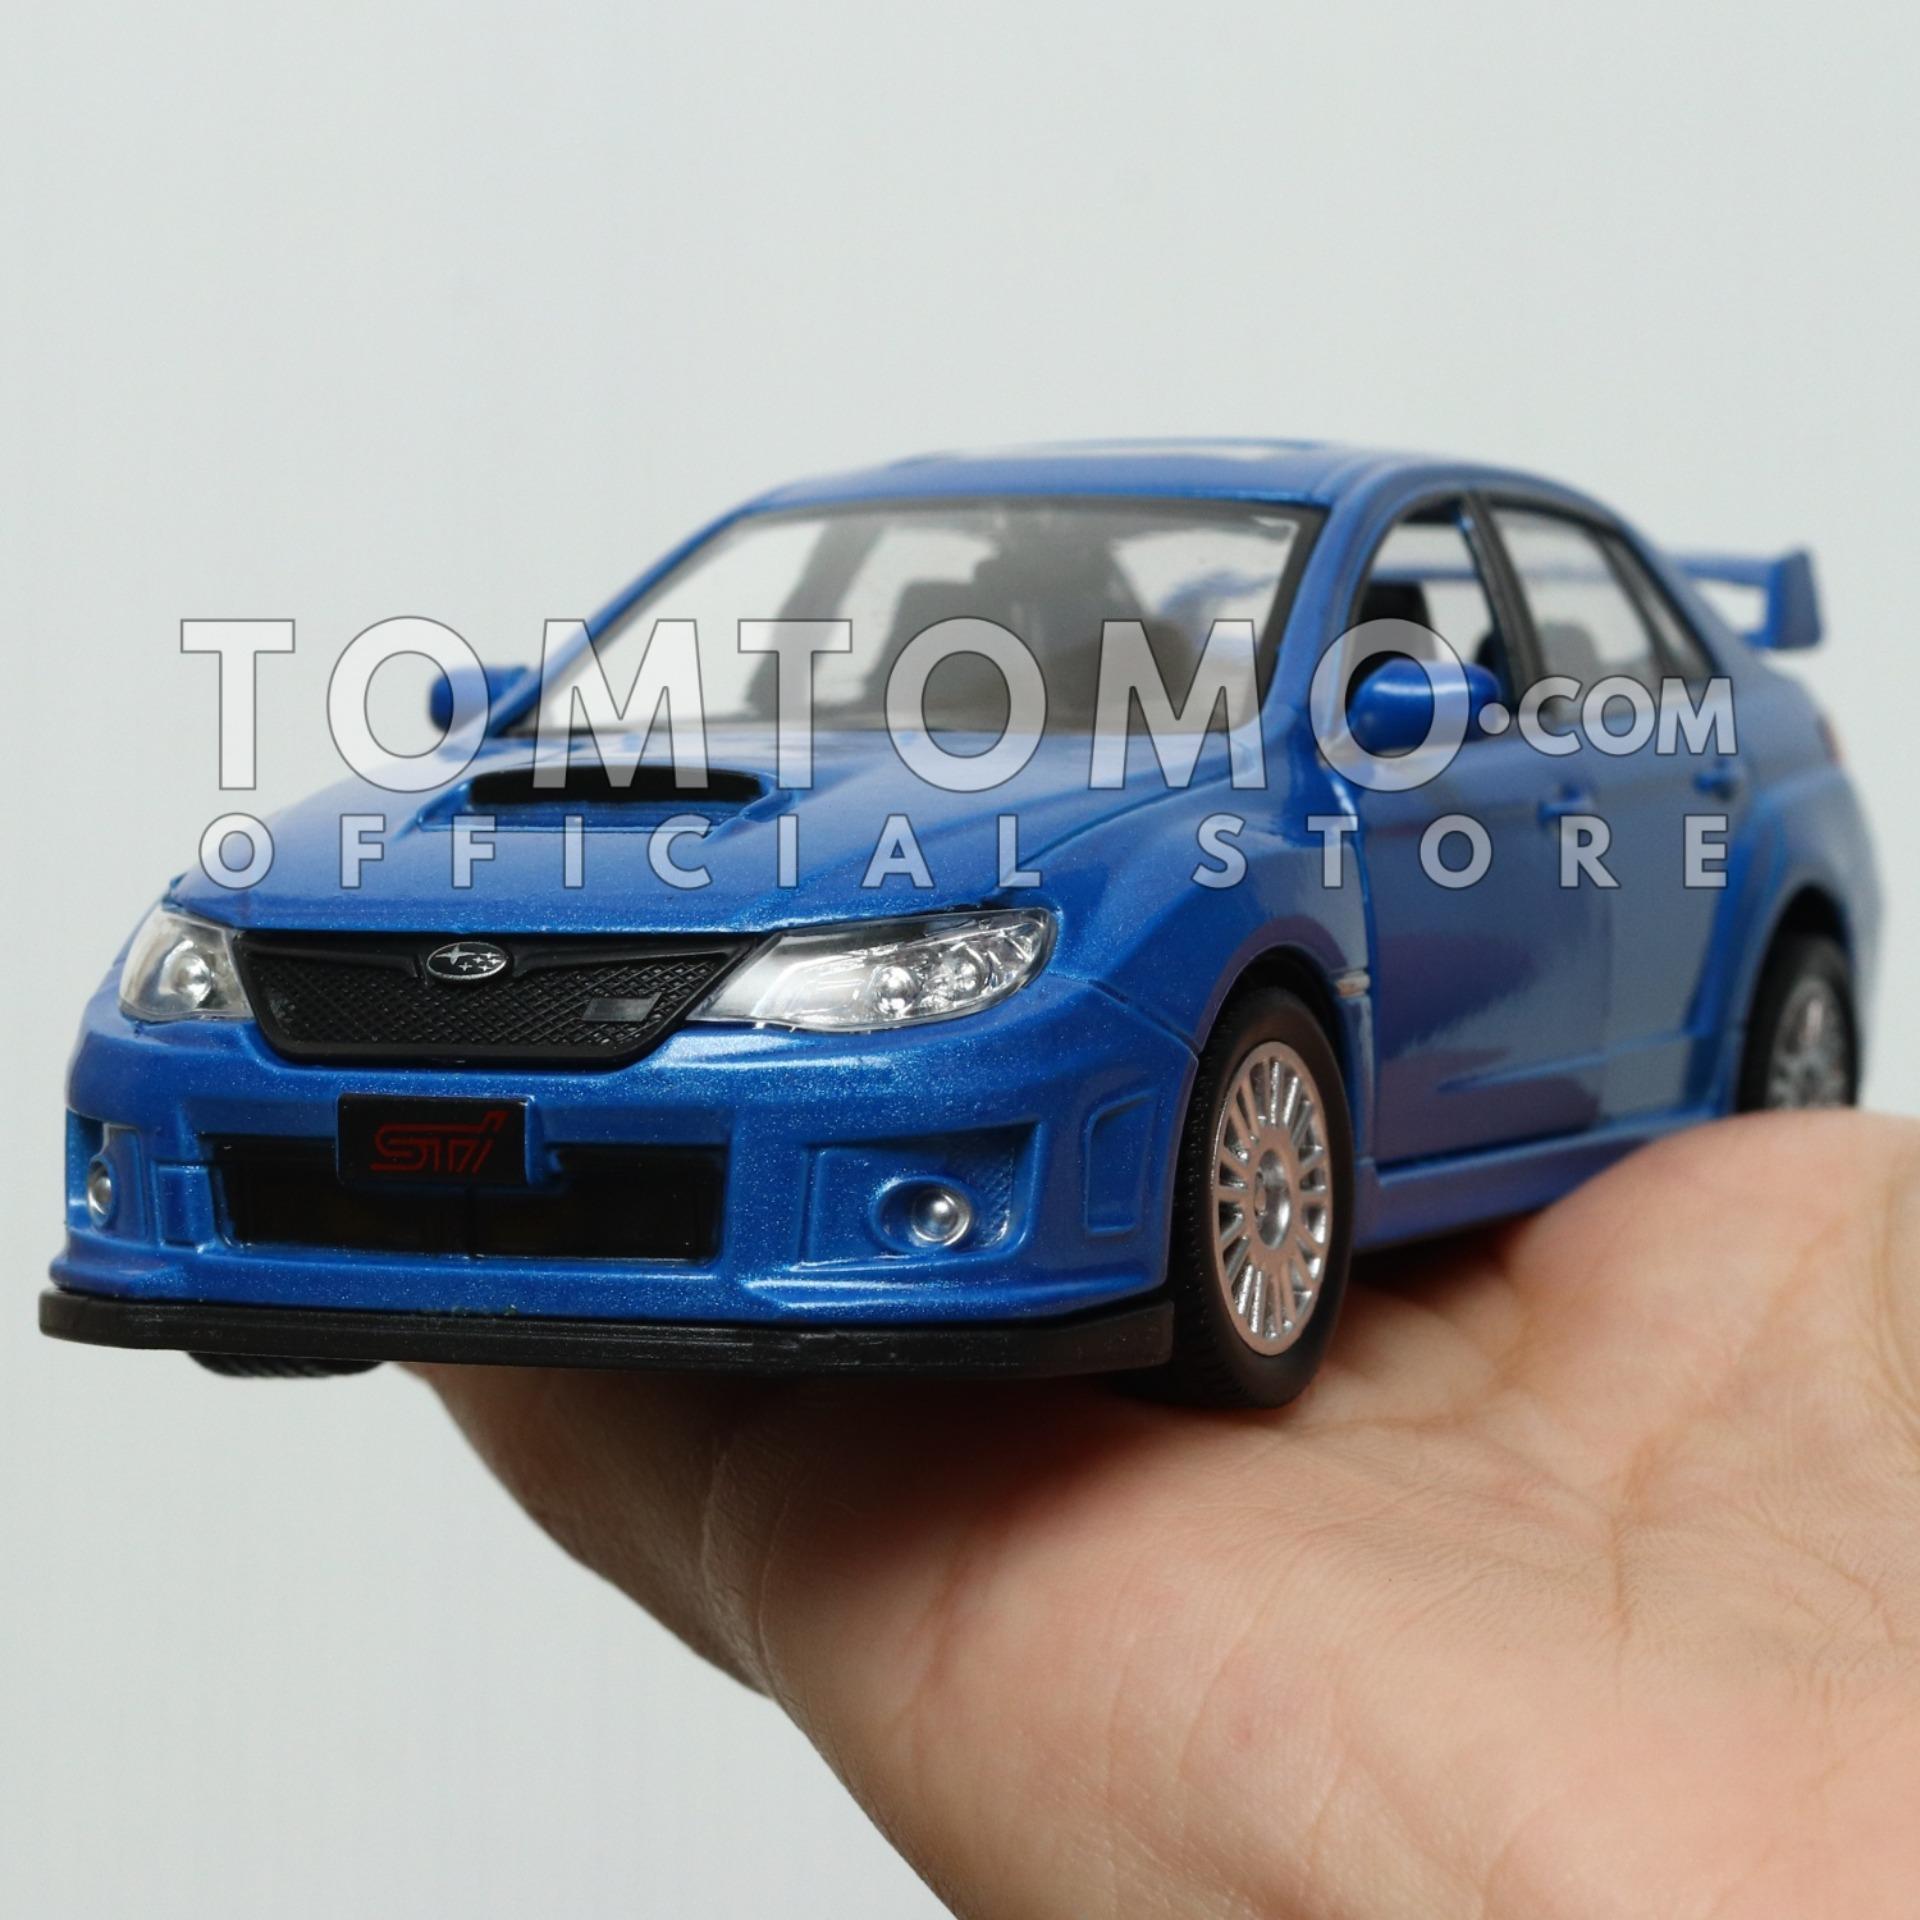 Beli Subaru Wrx Sti Diecast Miniatur Mobil Mobilan Sedan Sport Kado Ultah Mainan Anak Cowok Laki Unicar Tomtomo Online Jawa Tengah